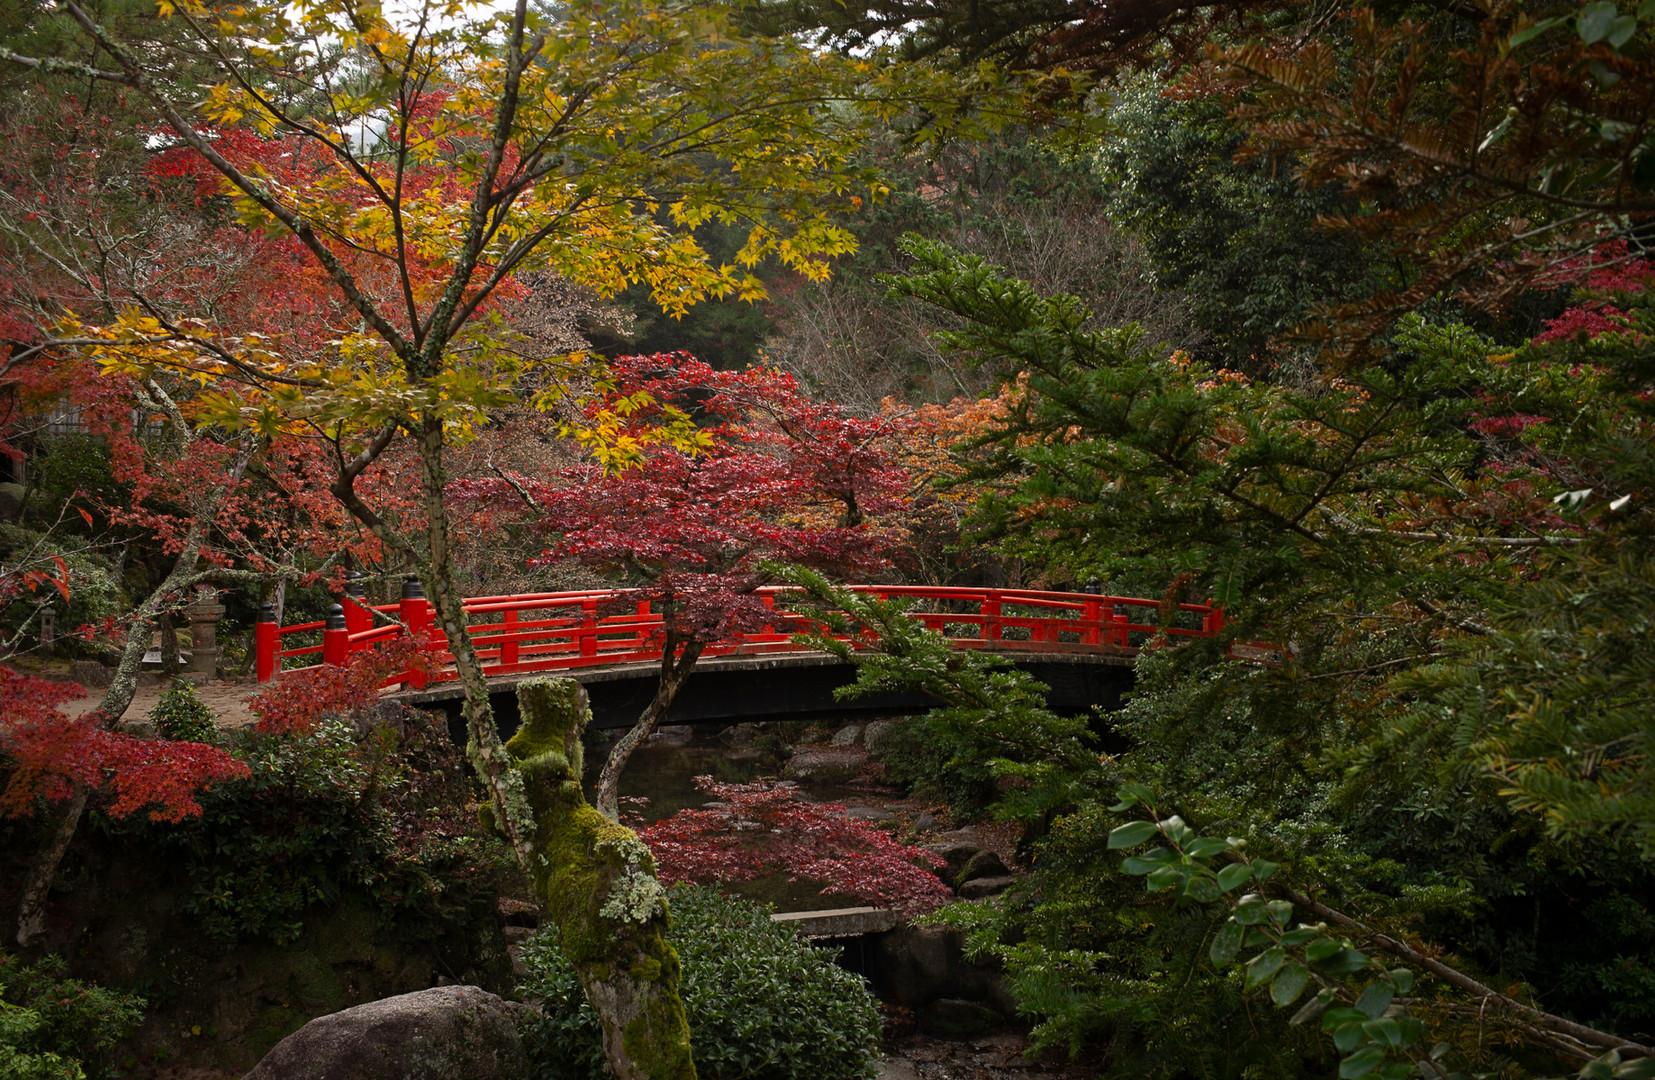 Red Bridge Mirayashima